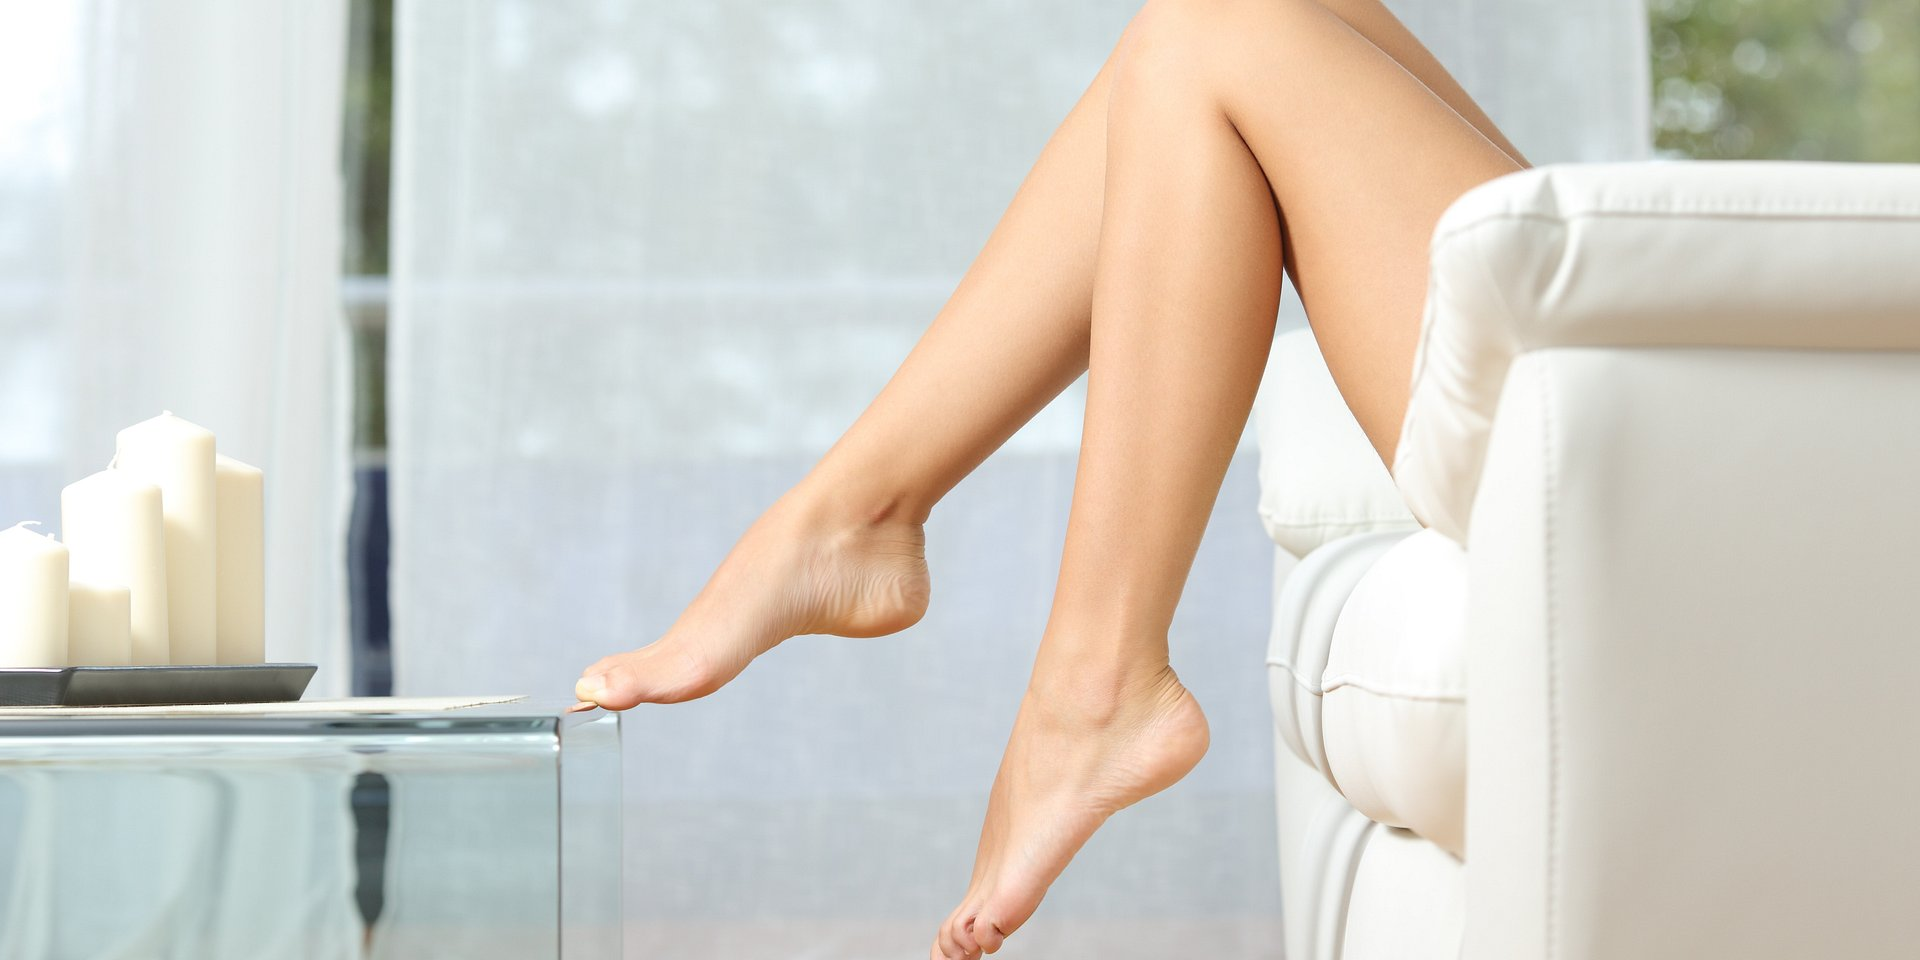 Dieta, która ma wpływ na nogi – bądź piękna na wiosnę!